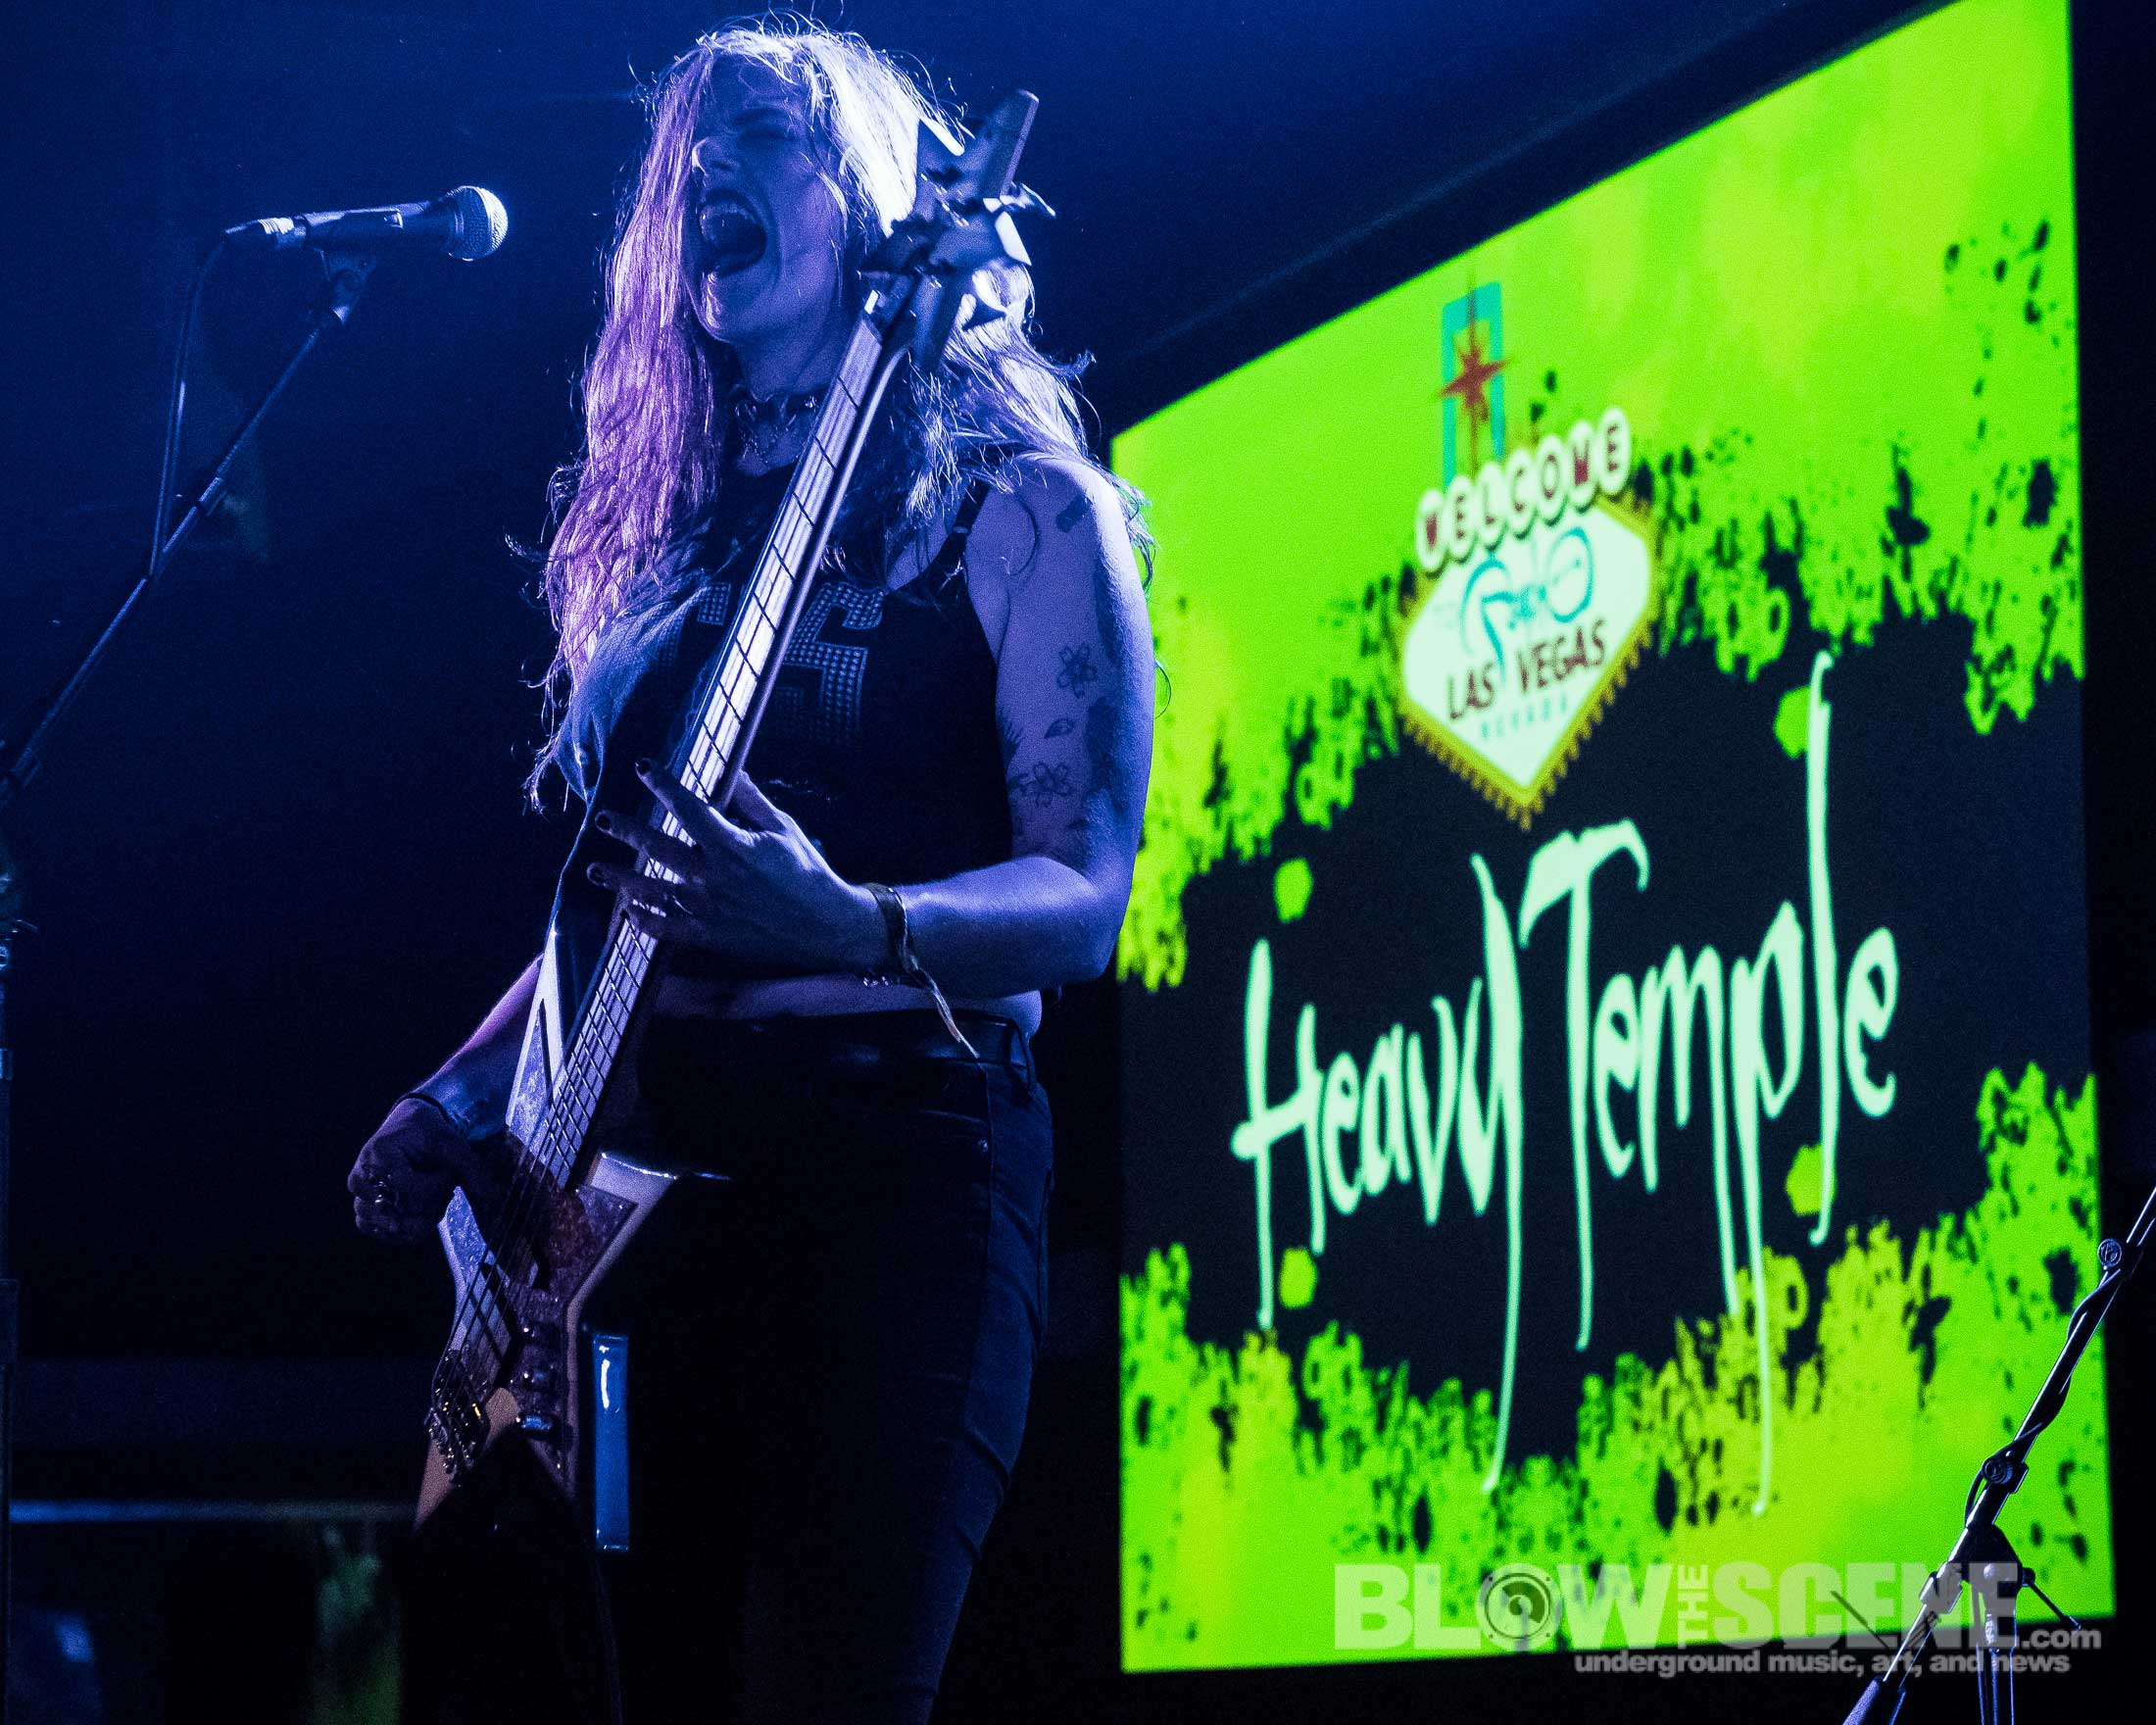 Heavy Temple live at Psycho Las Vegas 2017 by Dante Torrieri